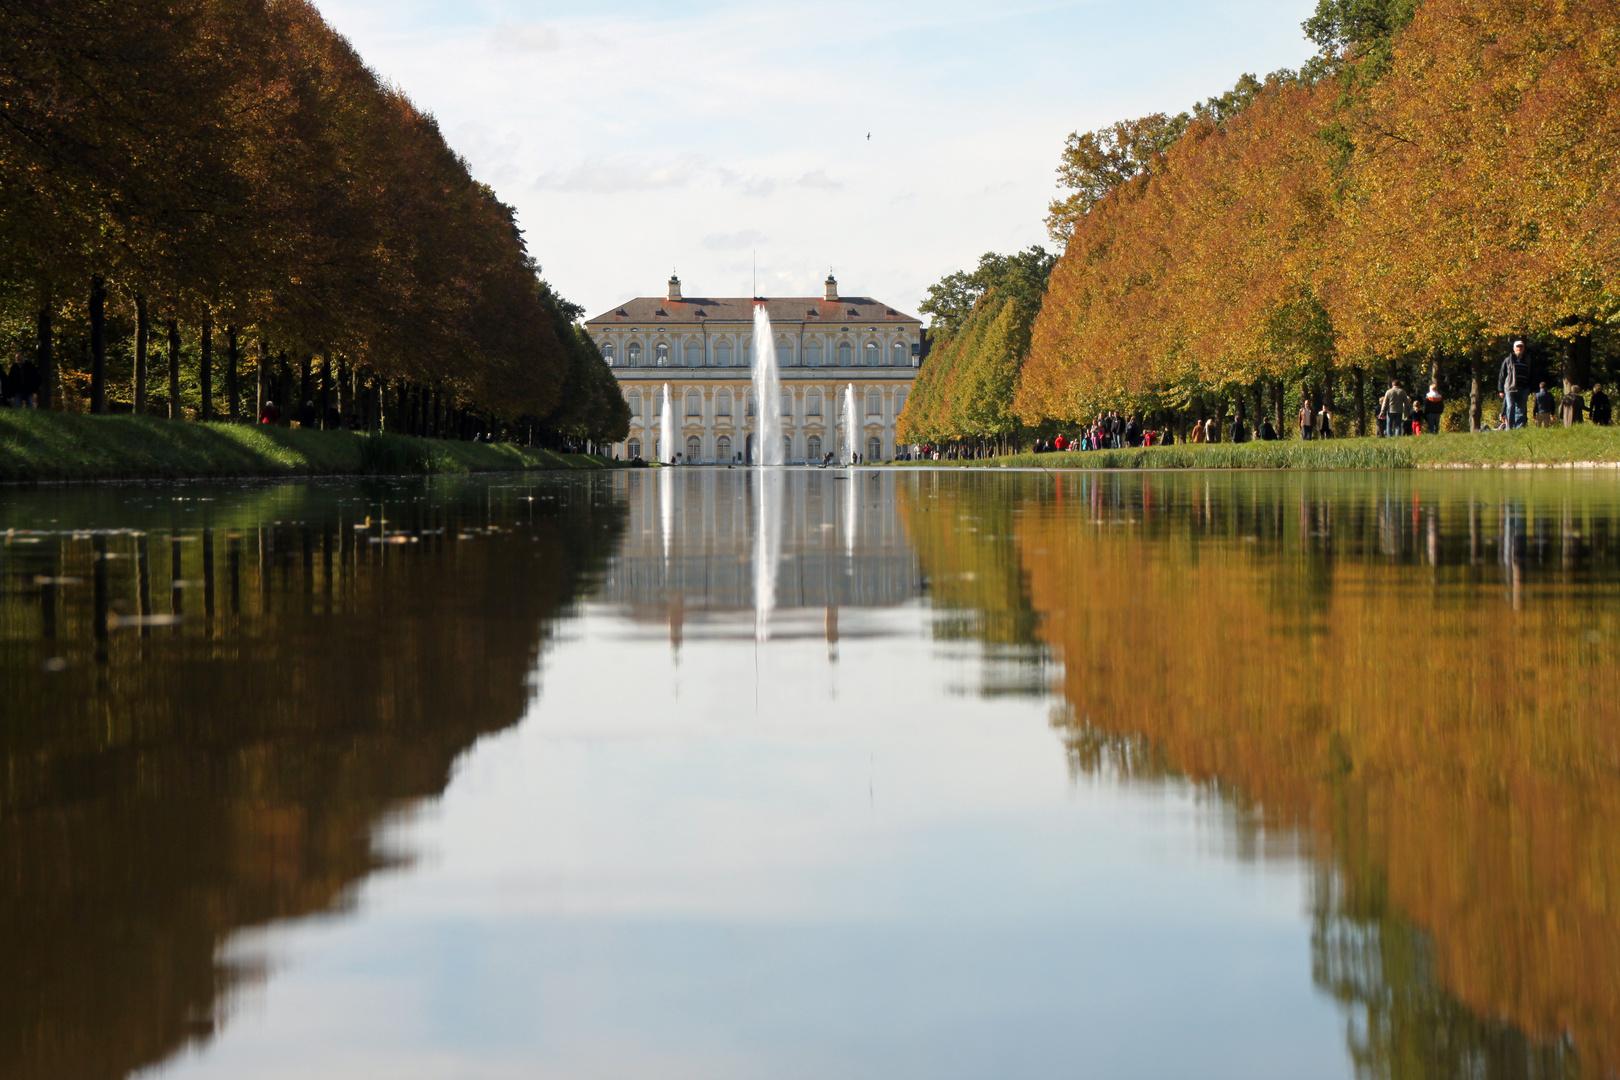 Herbst im Schloßpark